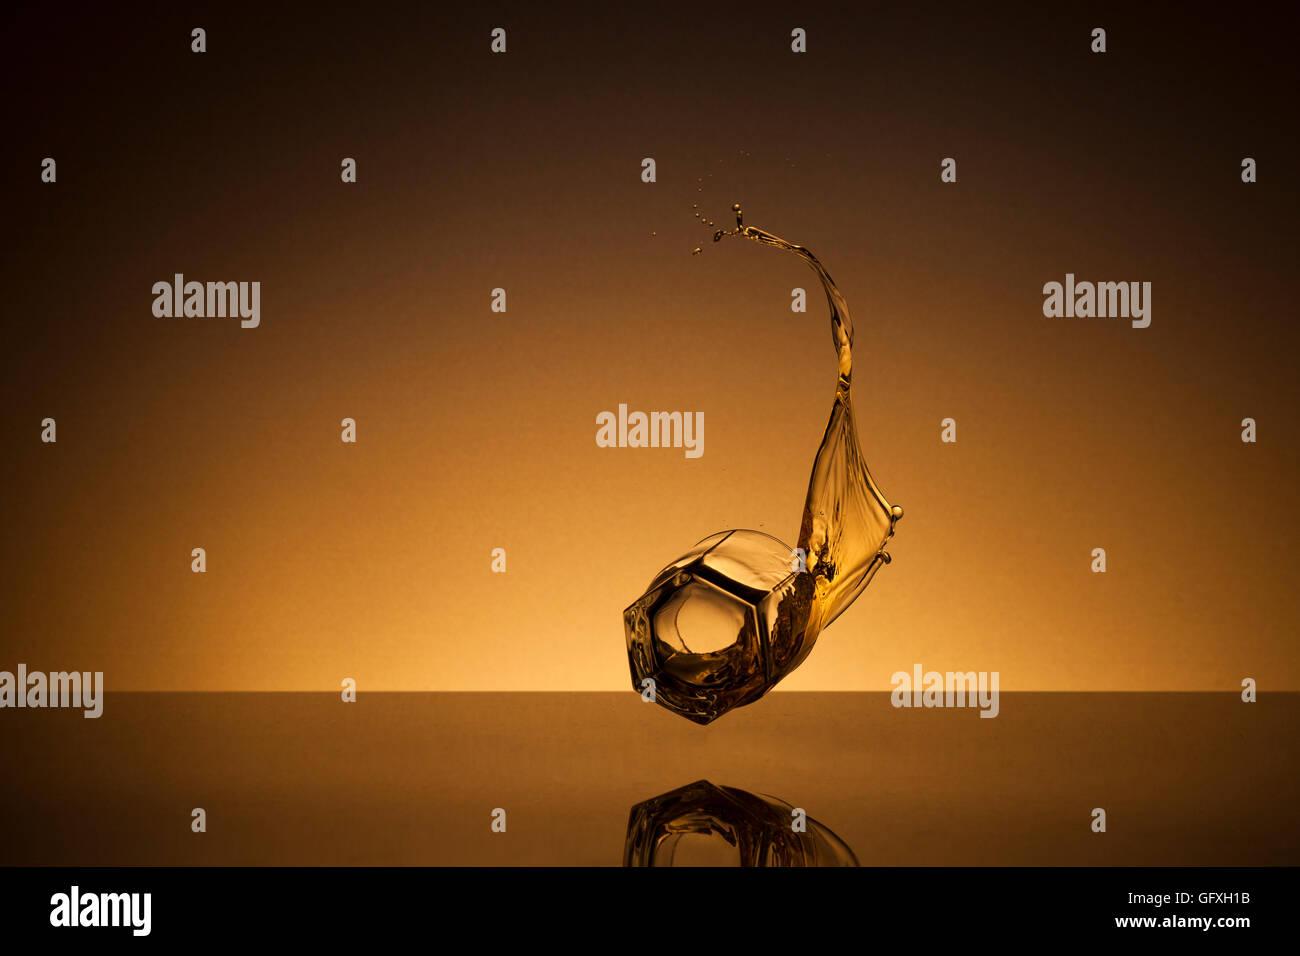 Flying glass of whiskey - Stock Image